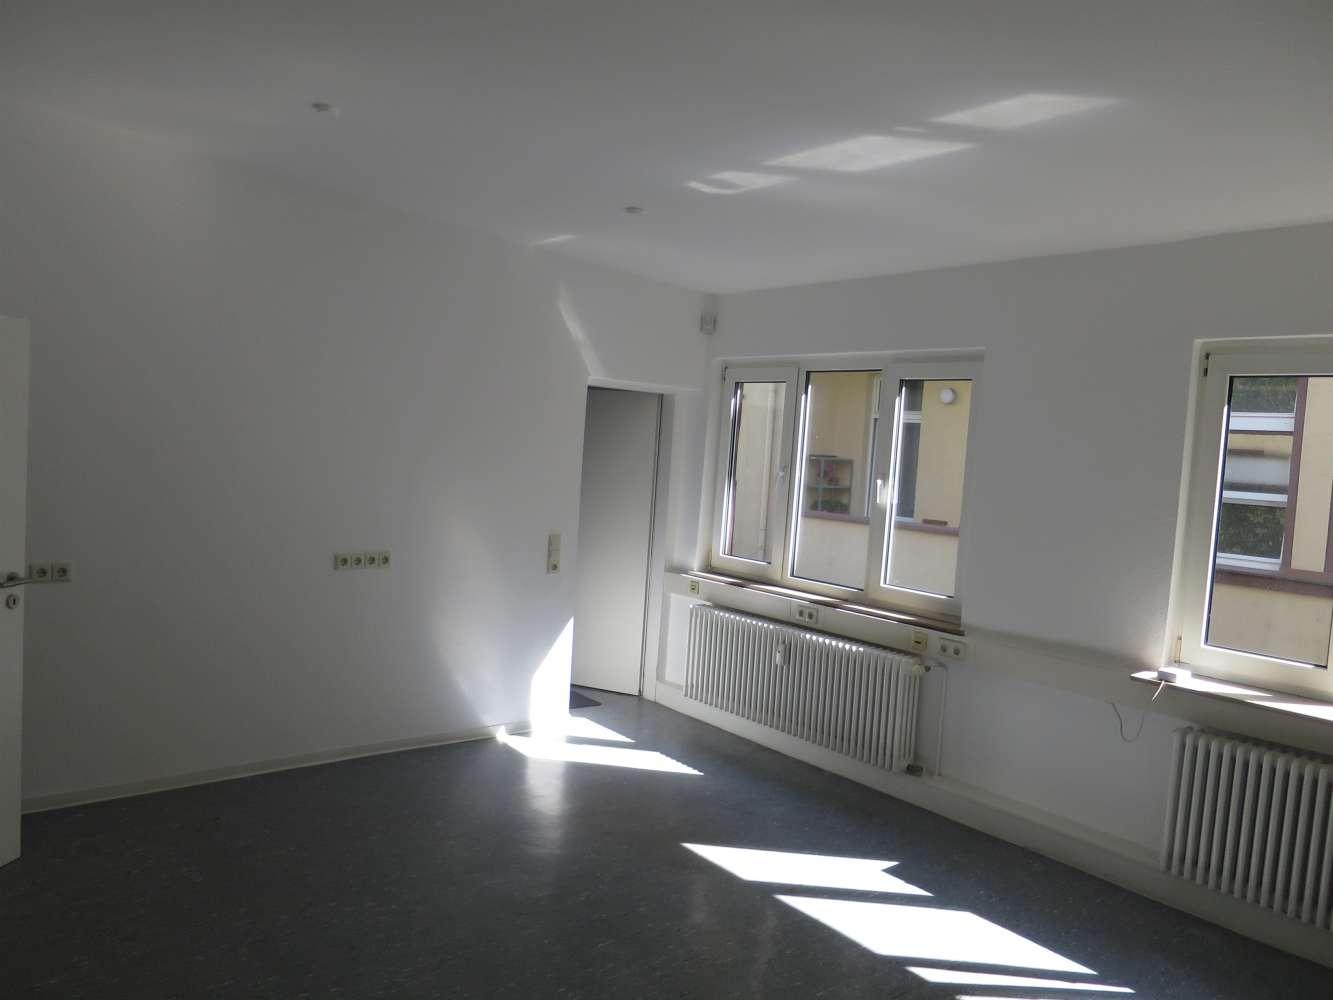 Büros Frankfurt am main, 60318 - Büro - Frankfurt am Main - F2425 - 10611546